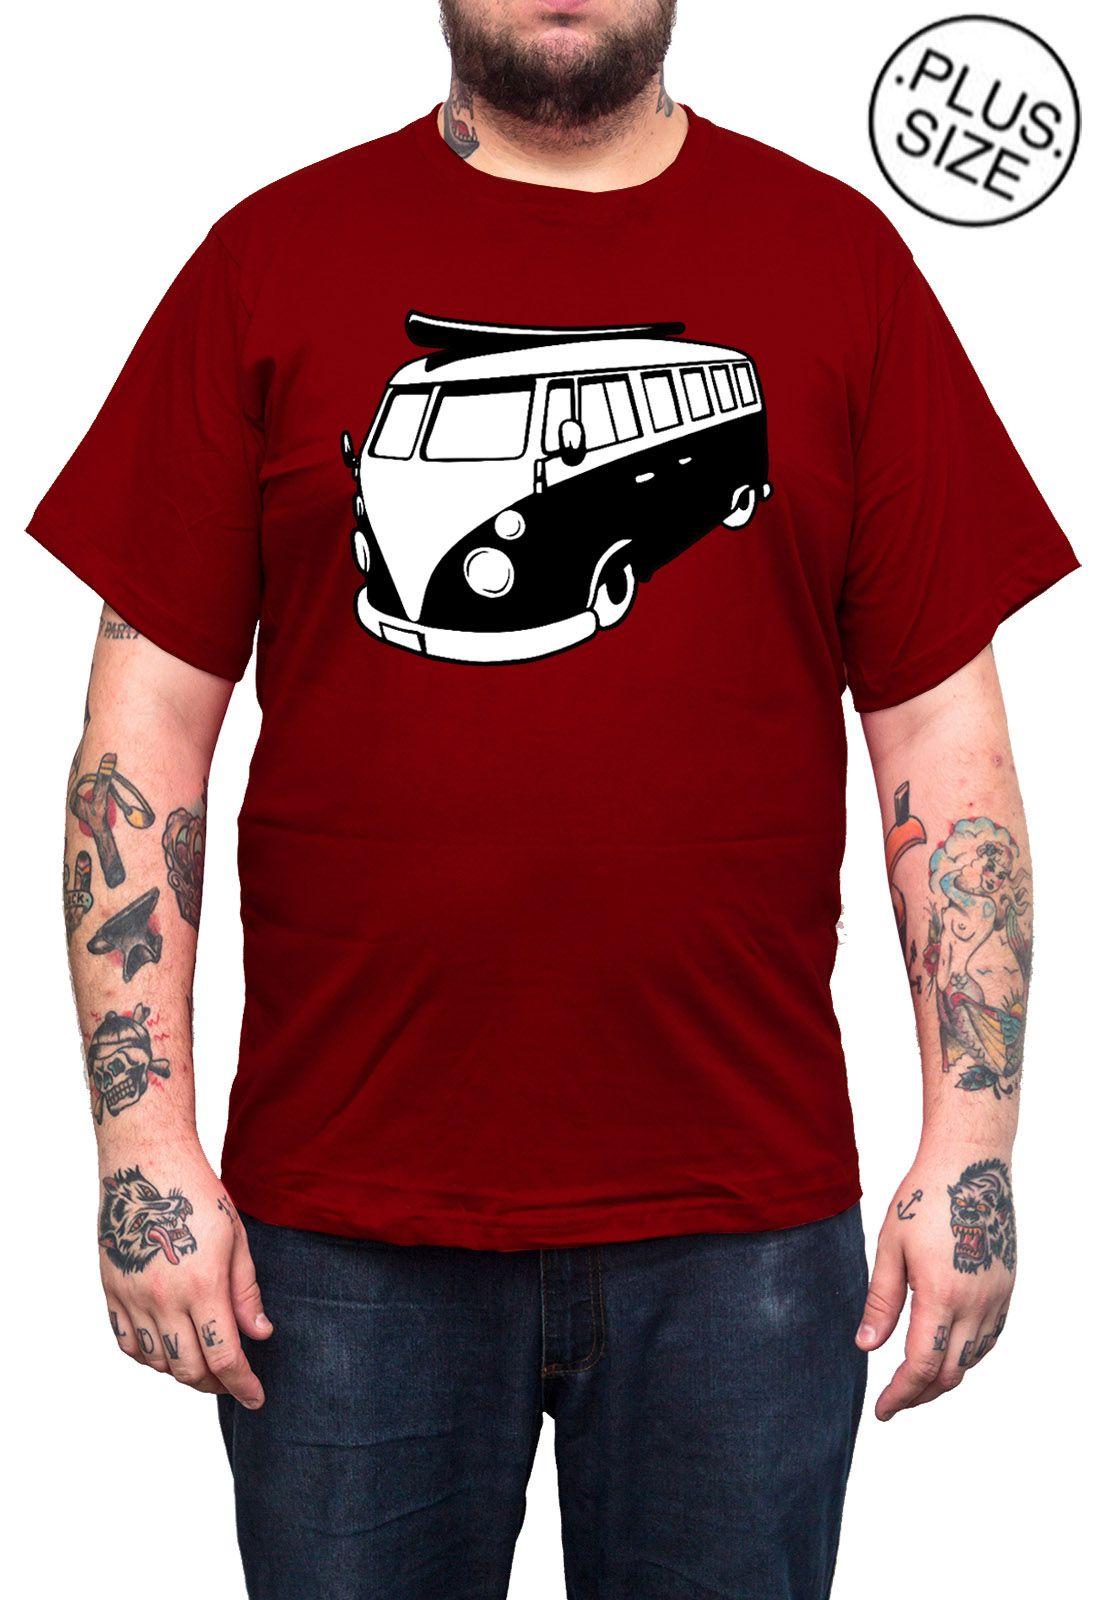 Camiseta Hshop Kombi - Vinho - Plus Size - Tamanho Grande XG  - HShop